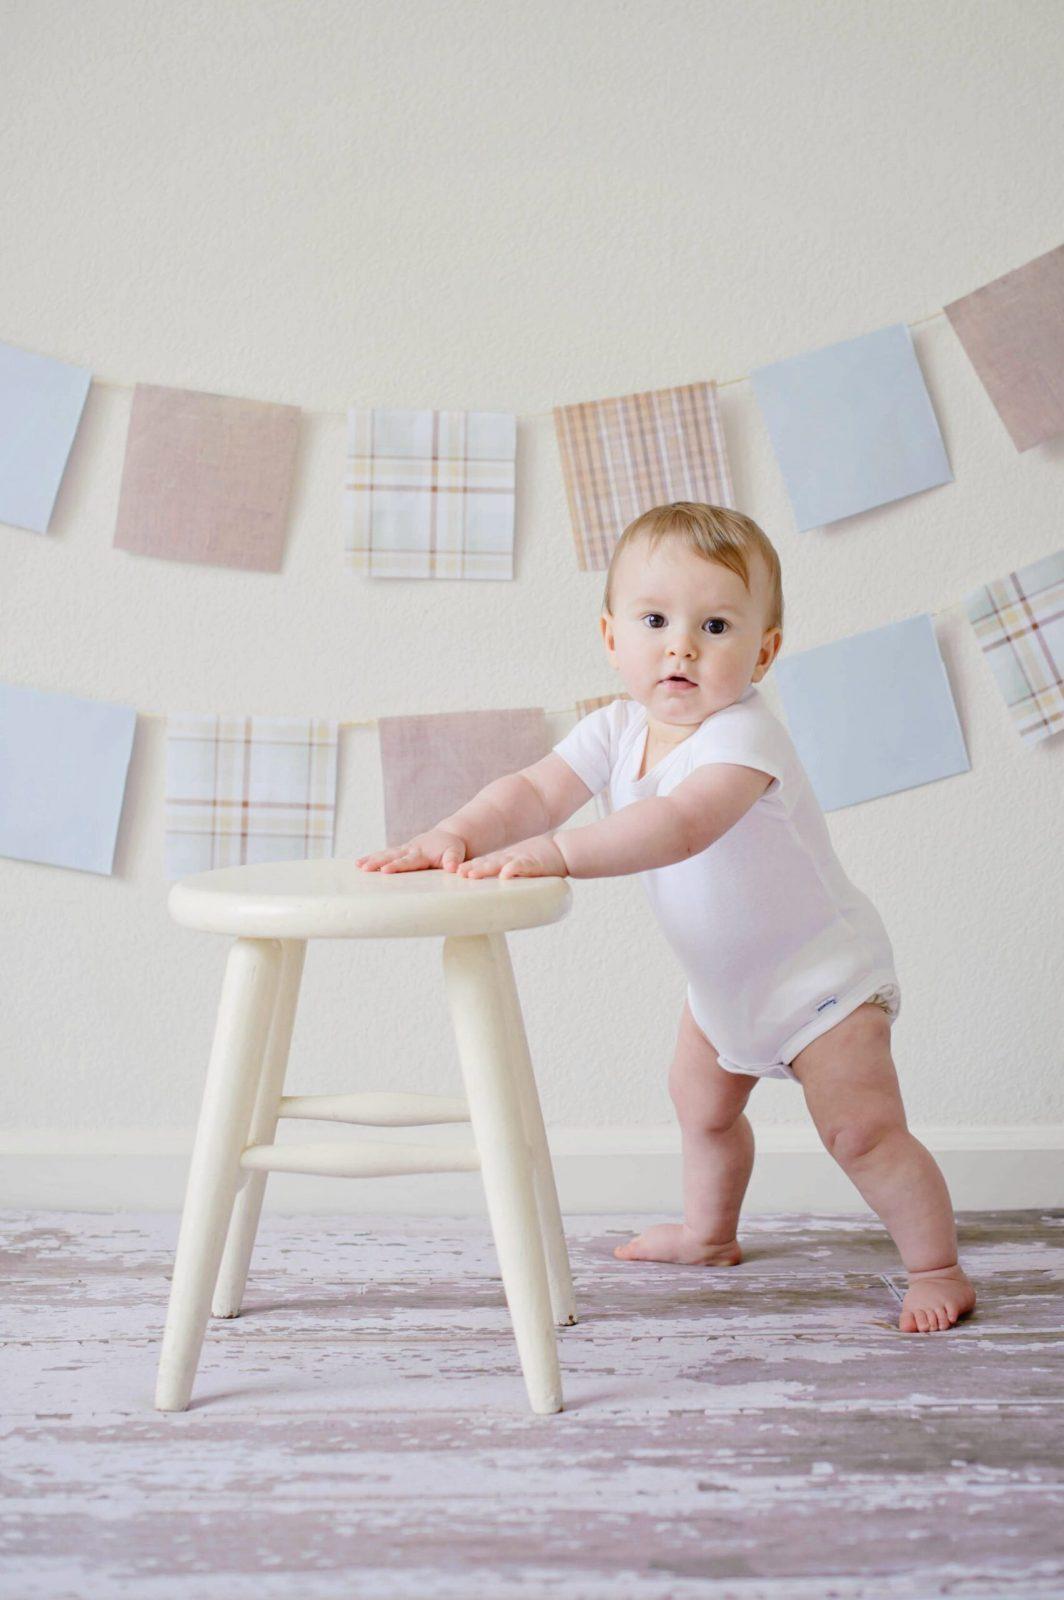 https://zutadella.com/wp-content/uploads/2020/07/adorable-baby-blur-chair-459976-scaled.jpg